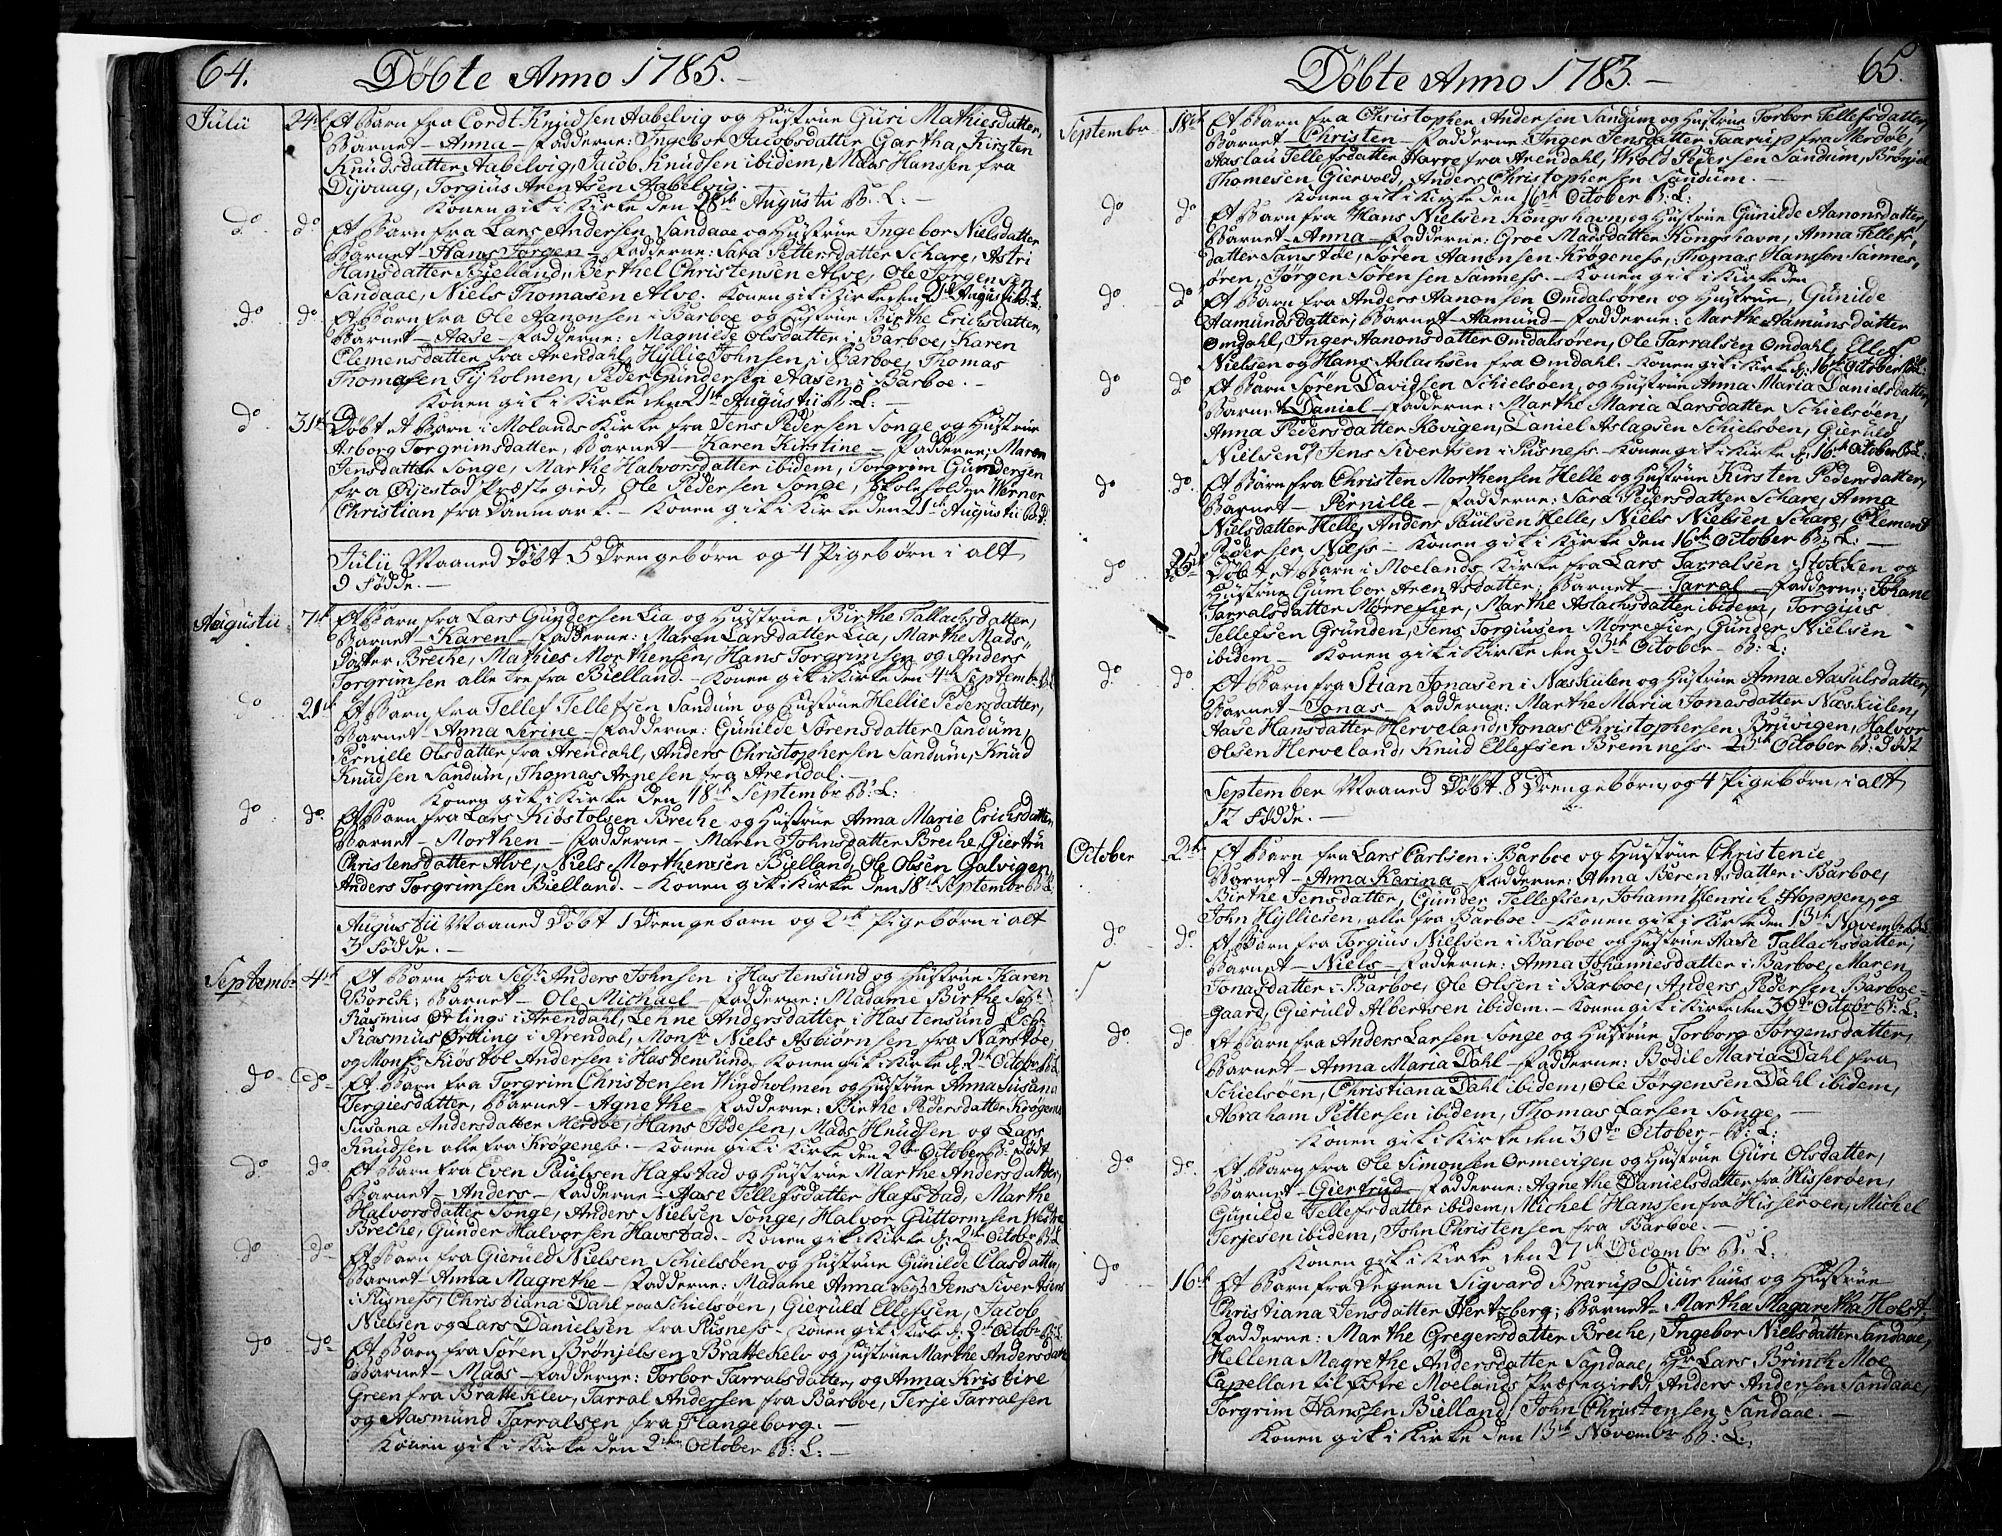 SAK, Tromøy sokneprestkontor, F/Fa/L0002: Ministerialbok nr. A 2, 1773-1808, s. 64-65